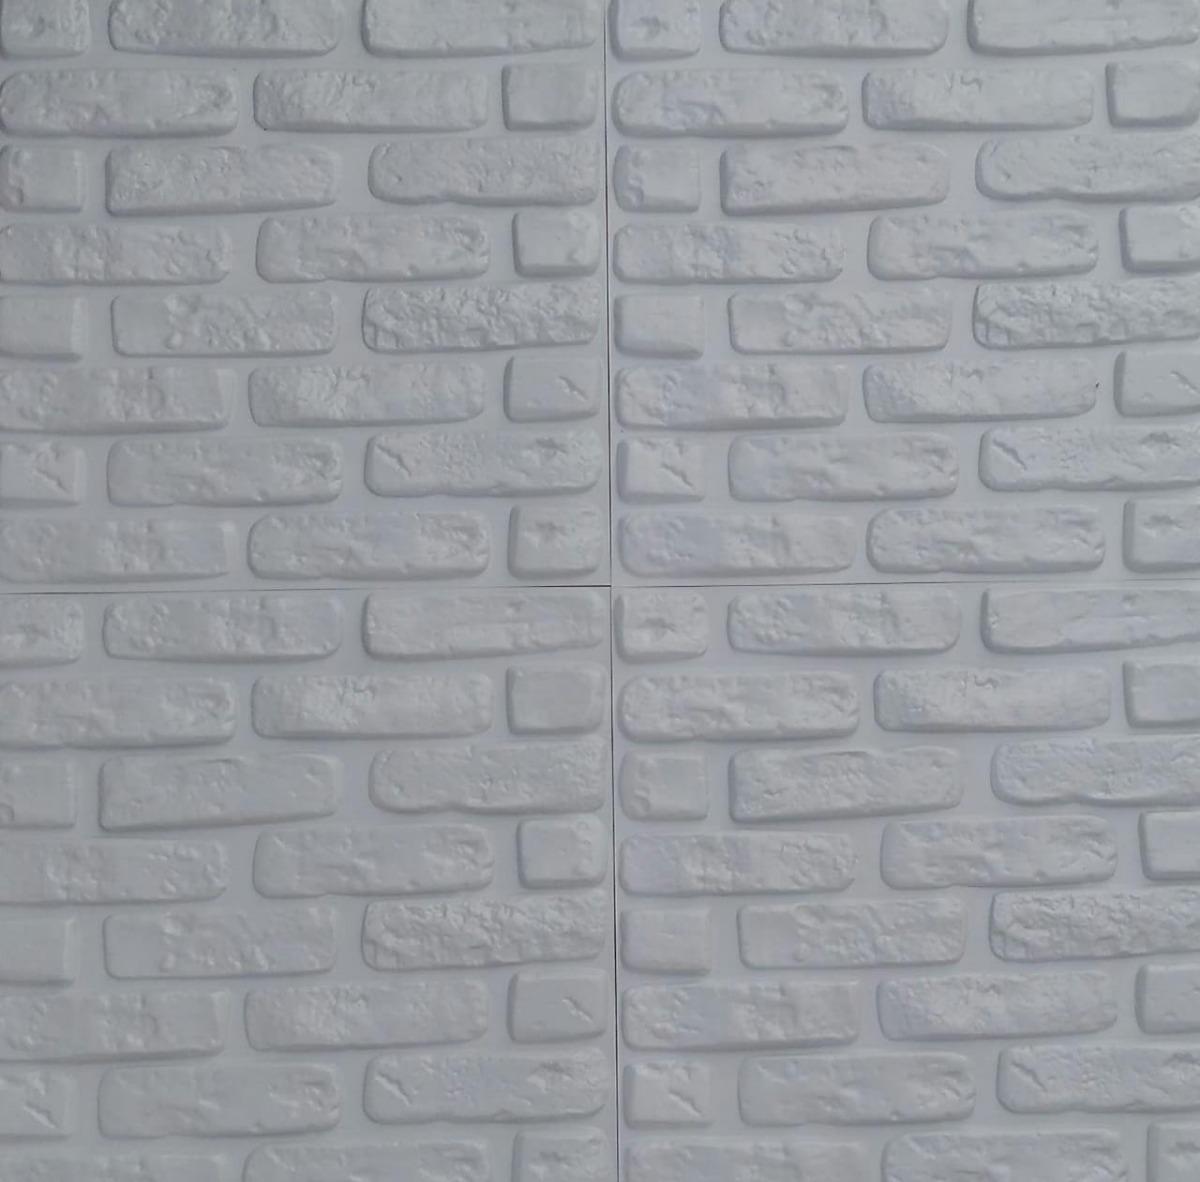 Placa de poliestireno tijollinho 3d de parede 50x50cm r - Placa de poliestireno ...